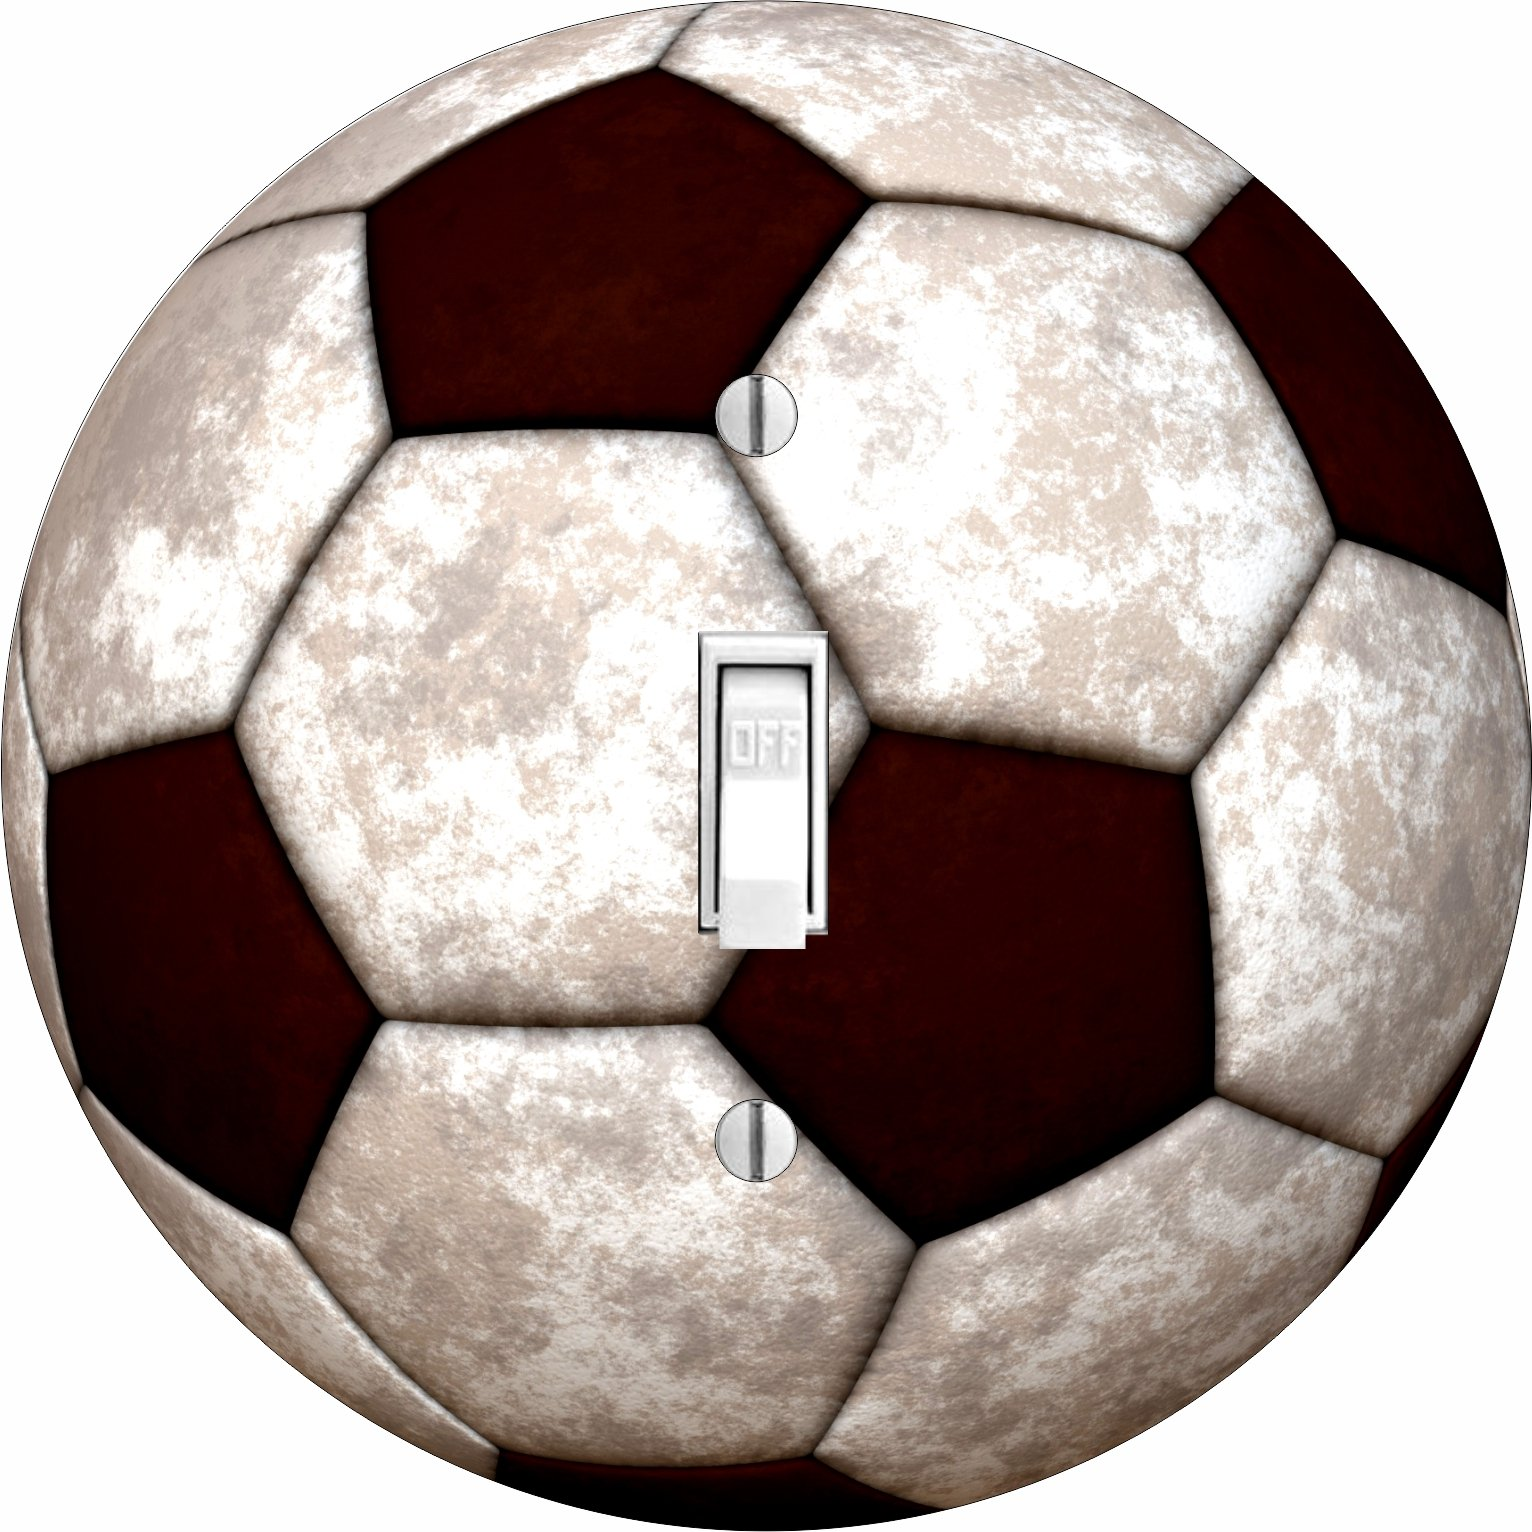 Boys Room Soccer Ball Hardboard Light Switch Cover for Single Lightswitch